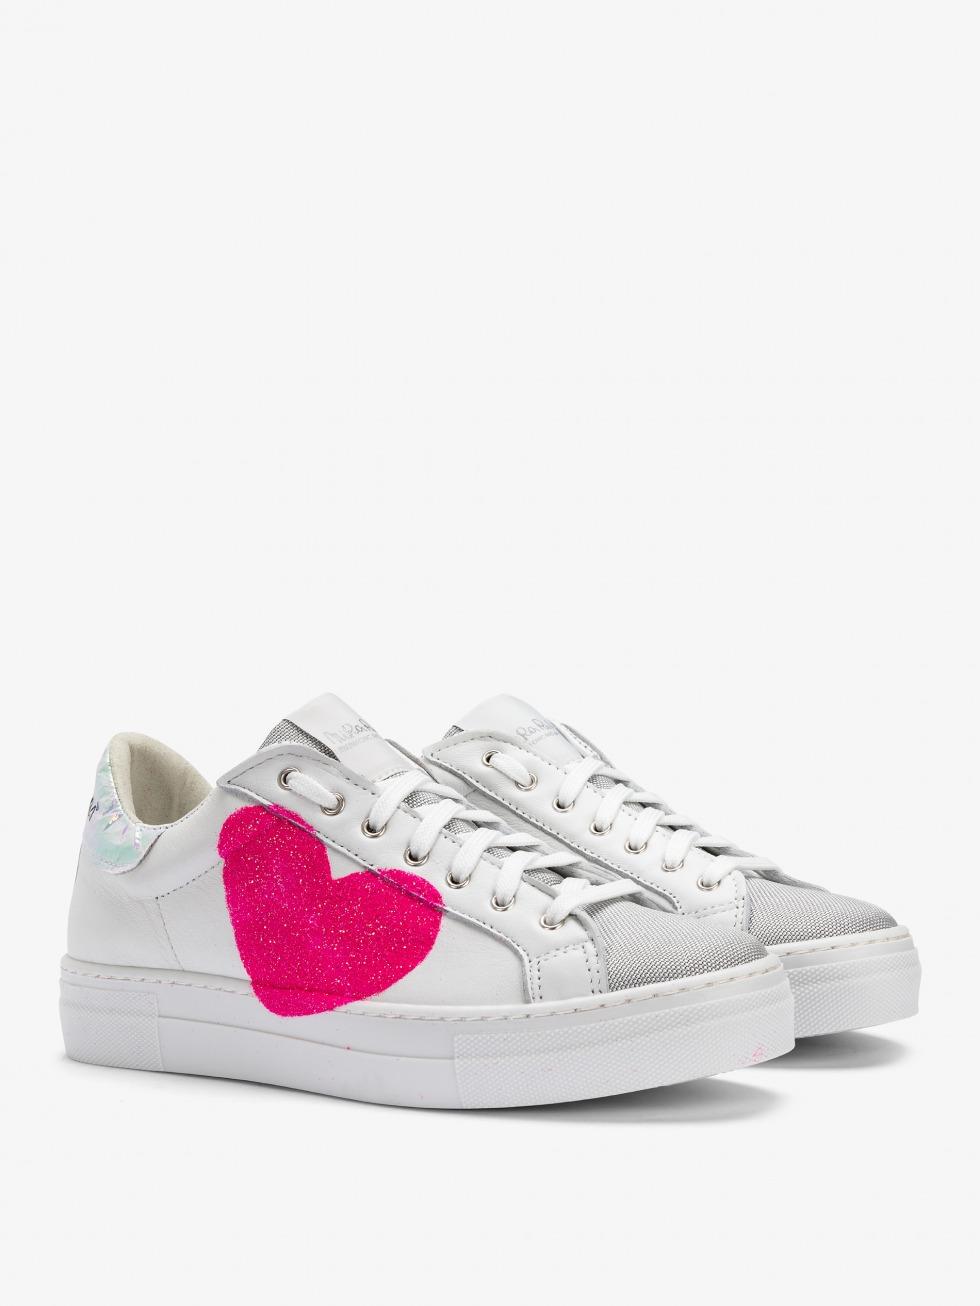 Sneakers Martini - Cuore Urania